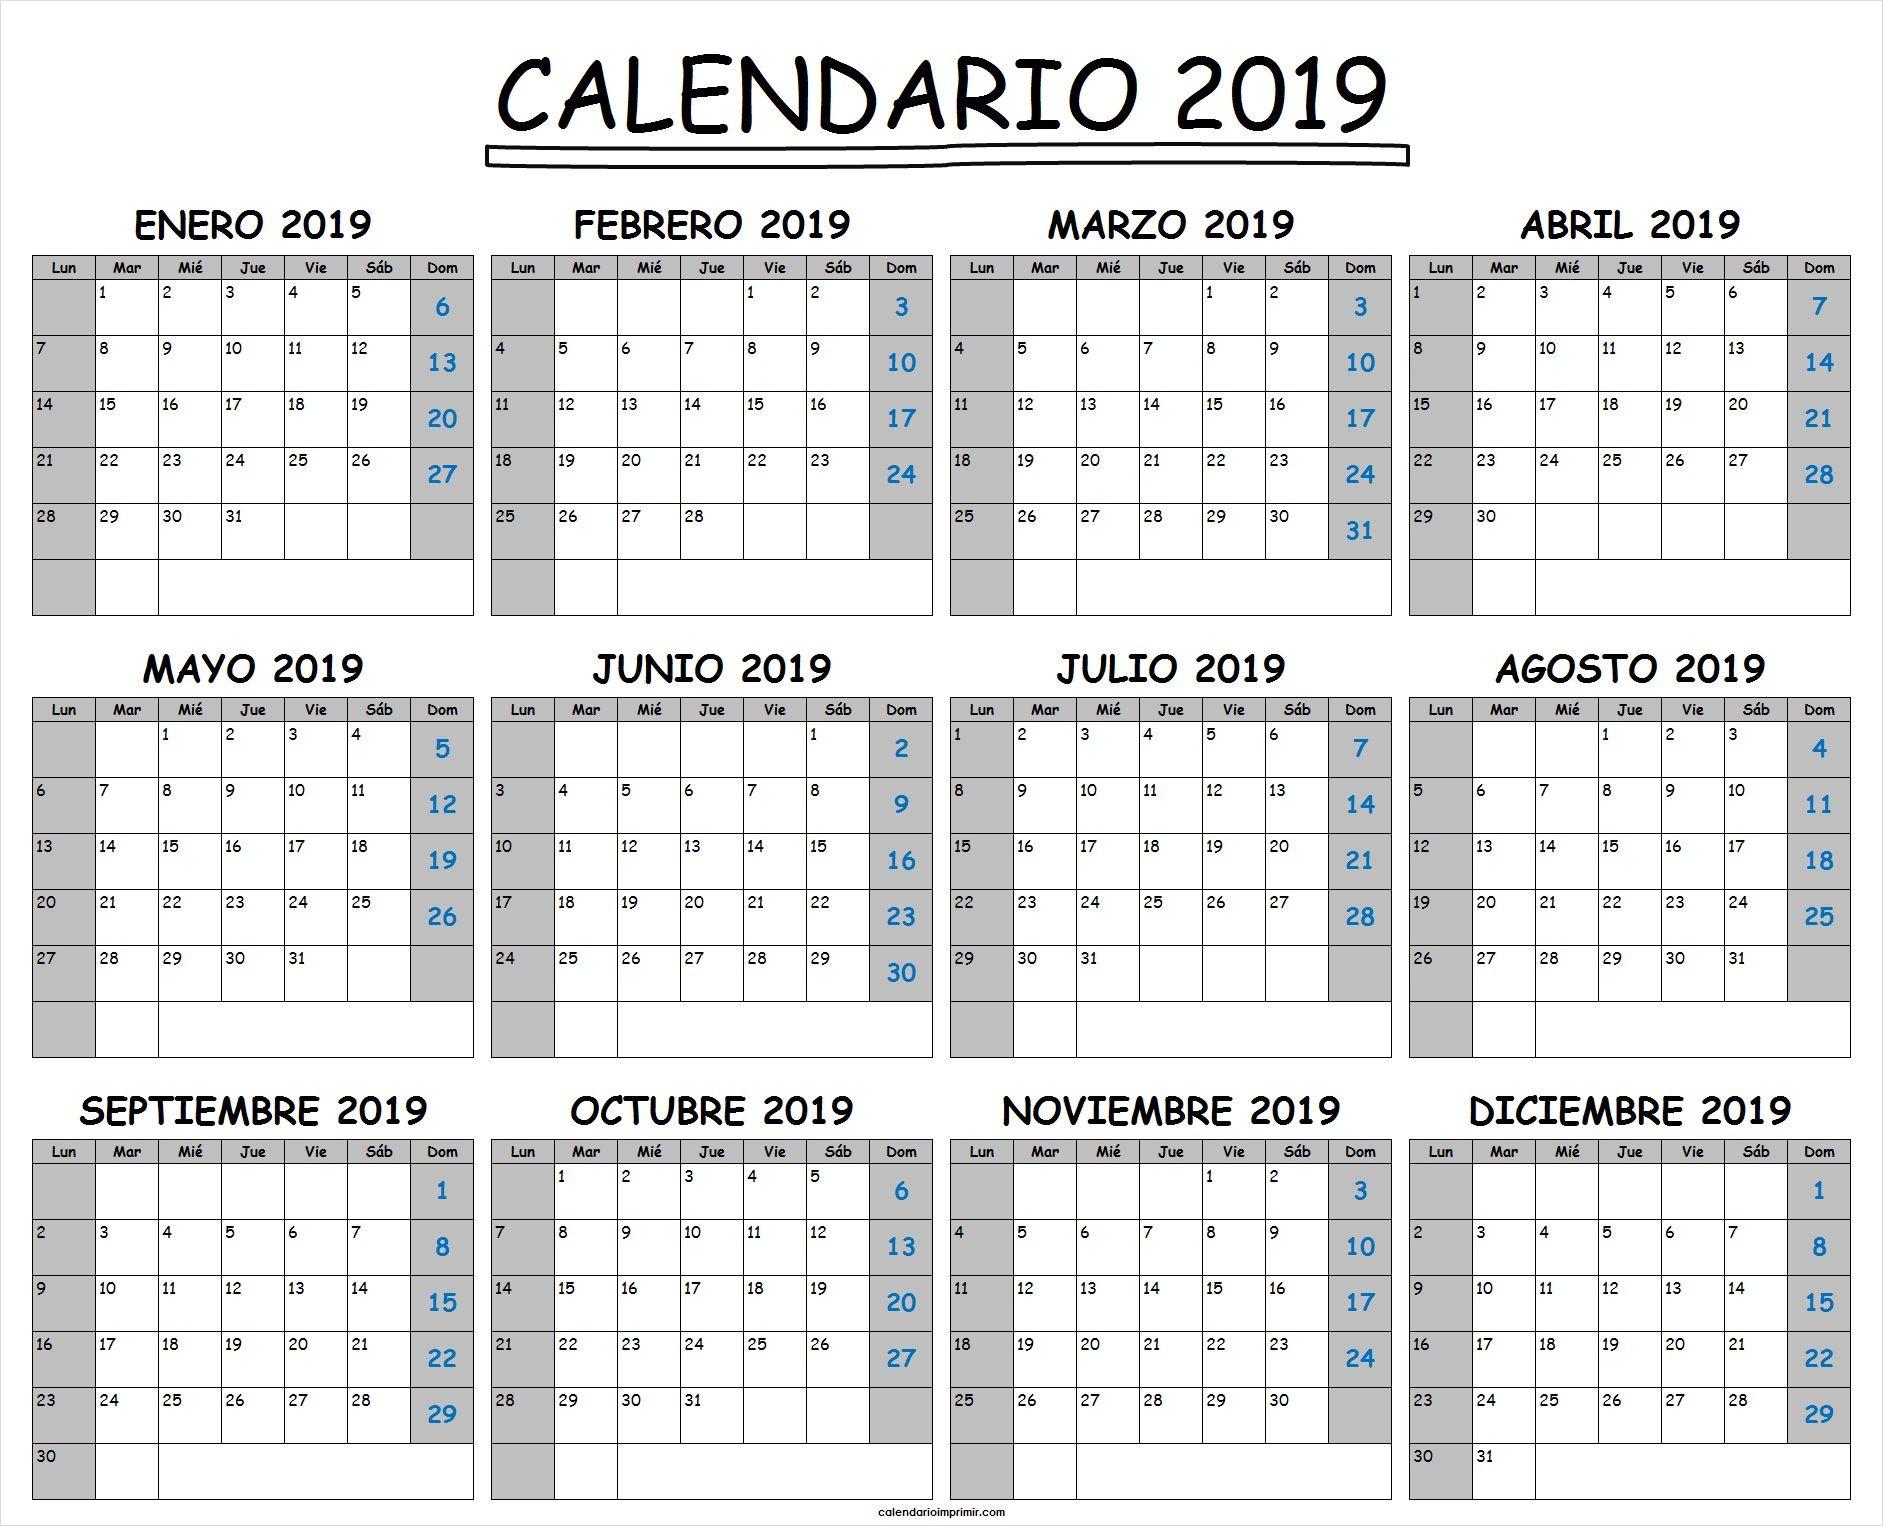 Calendario 2020 Excel Italiano.Formato Calendario 2019 Emayti Australianuniversities Co